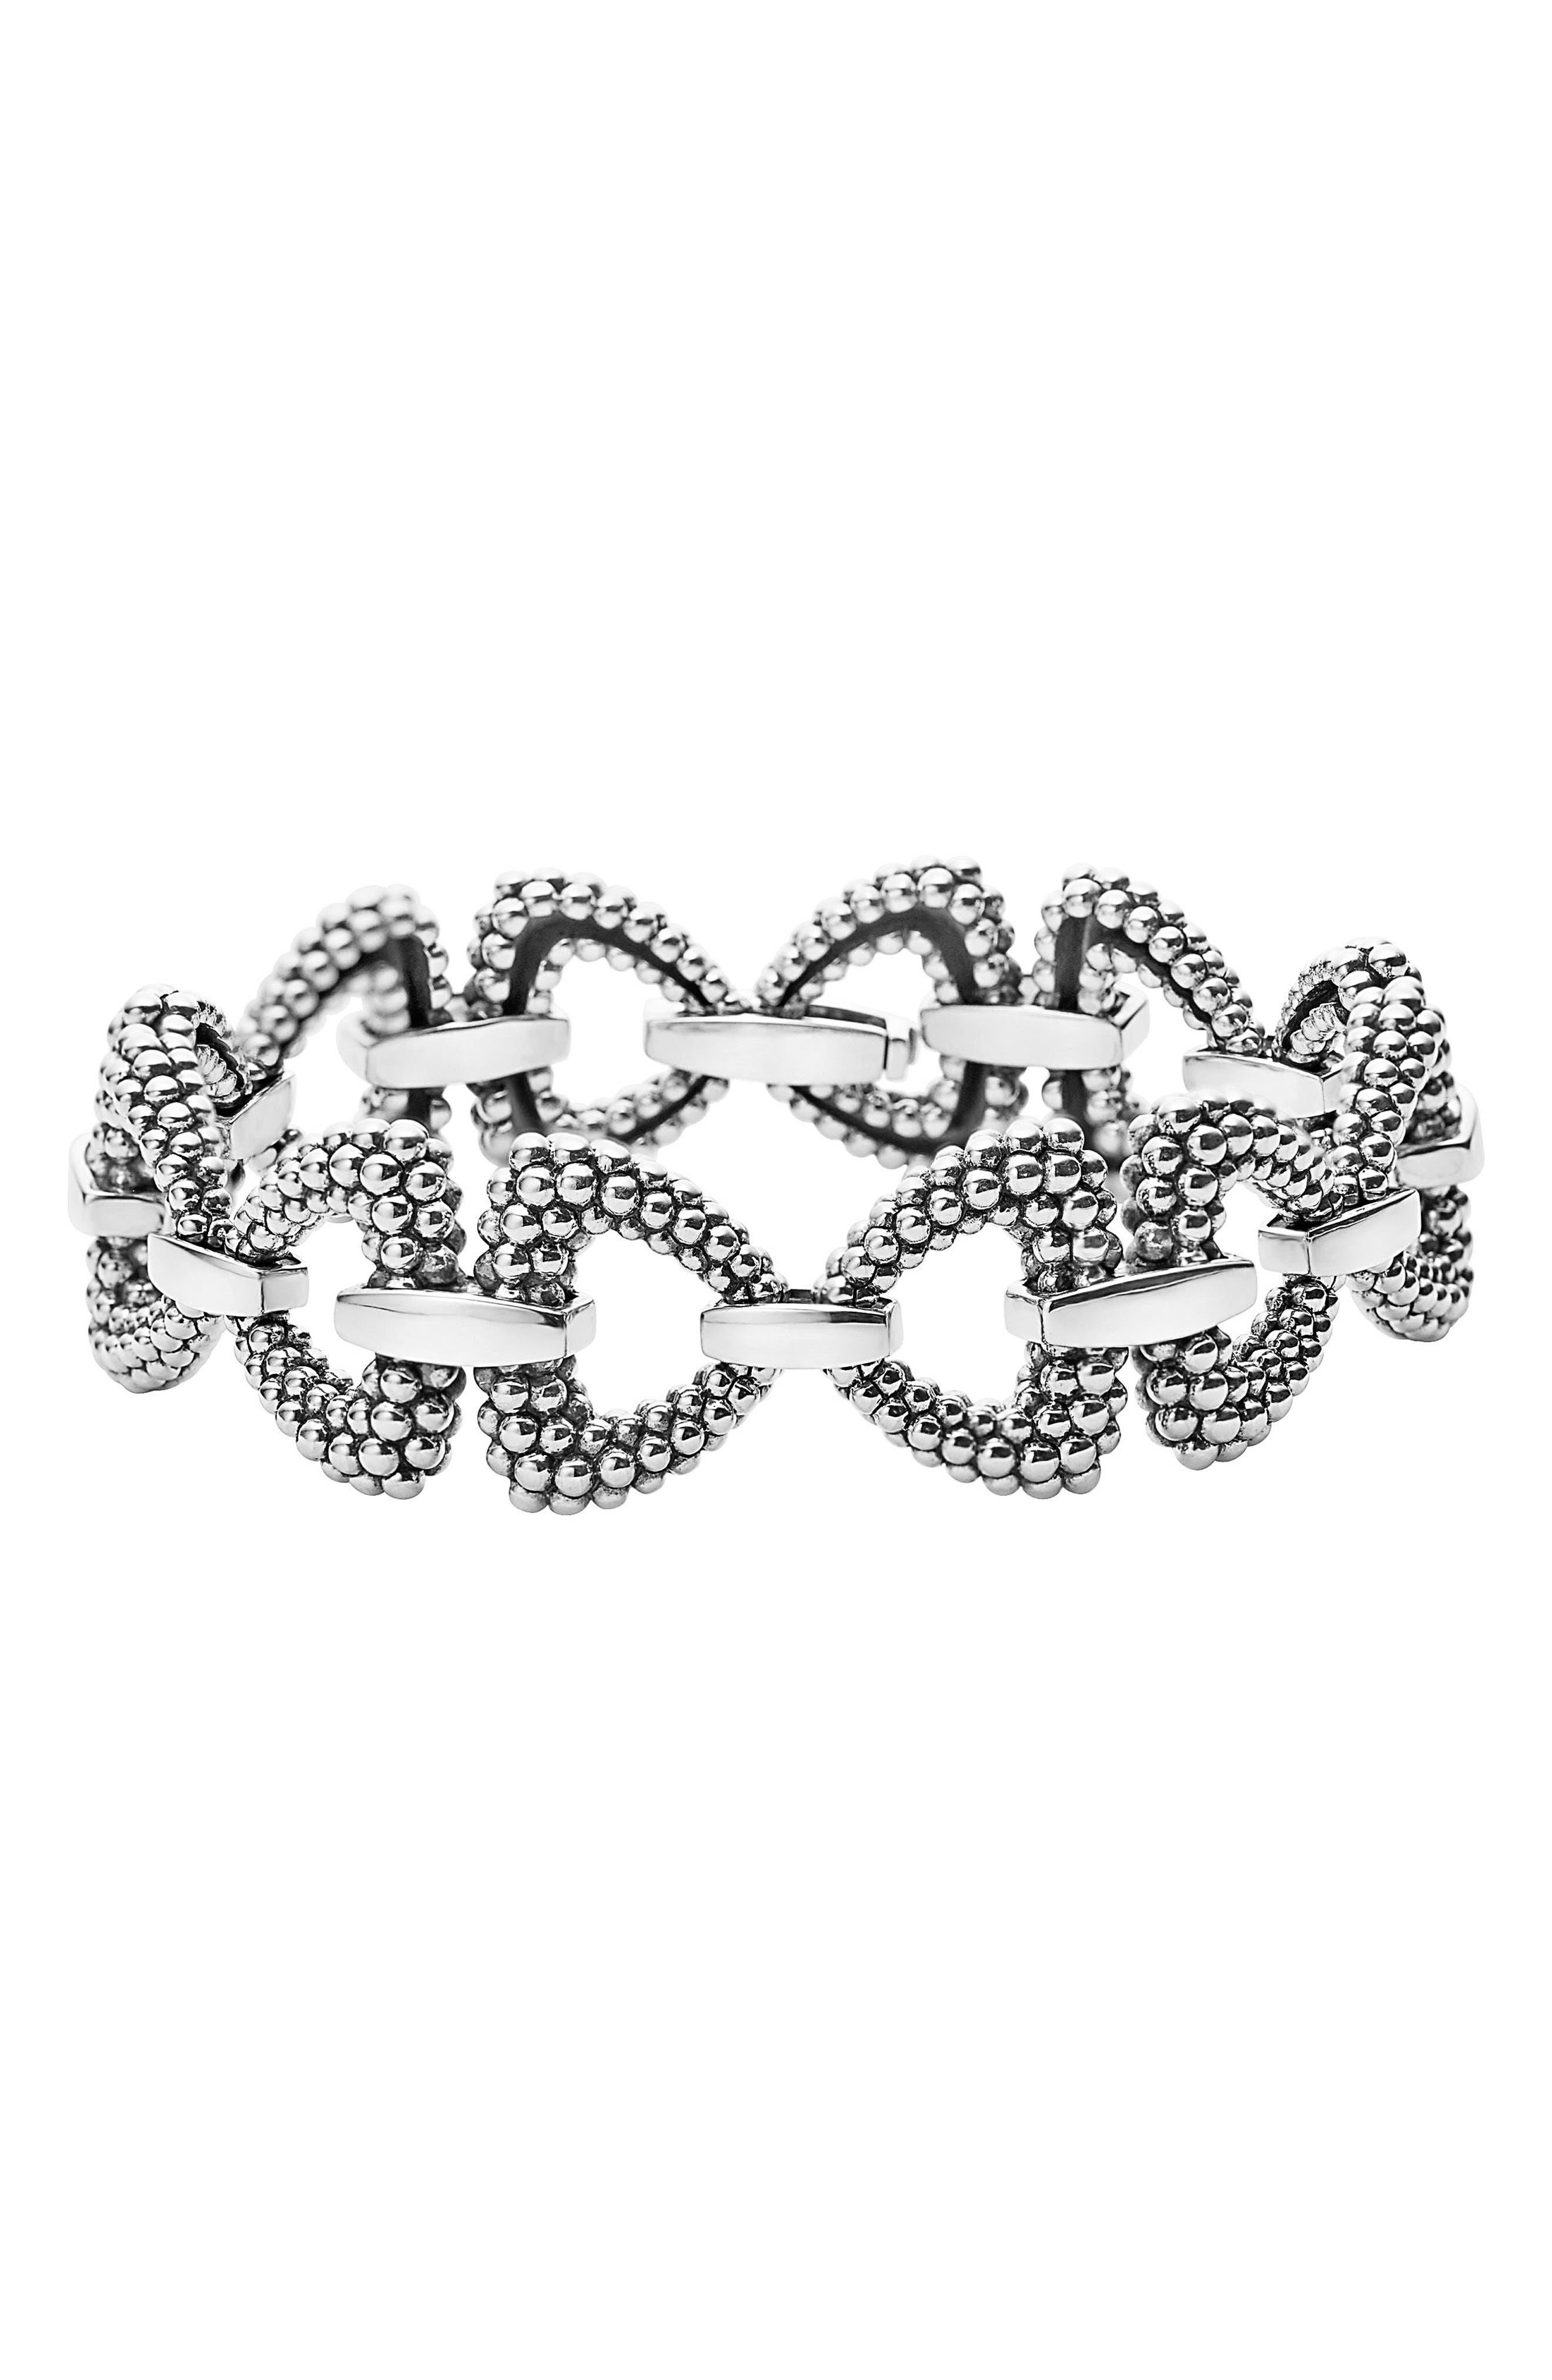 LAGOS Derby Caviar Connector Link Bracelet